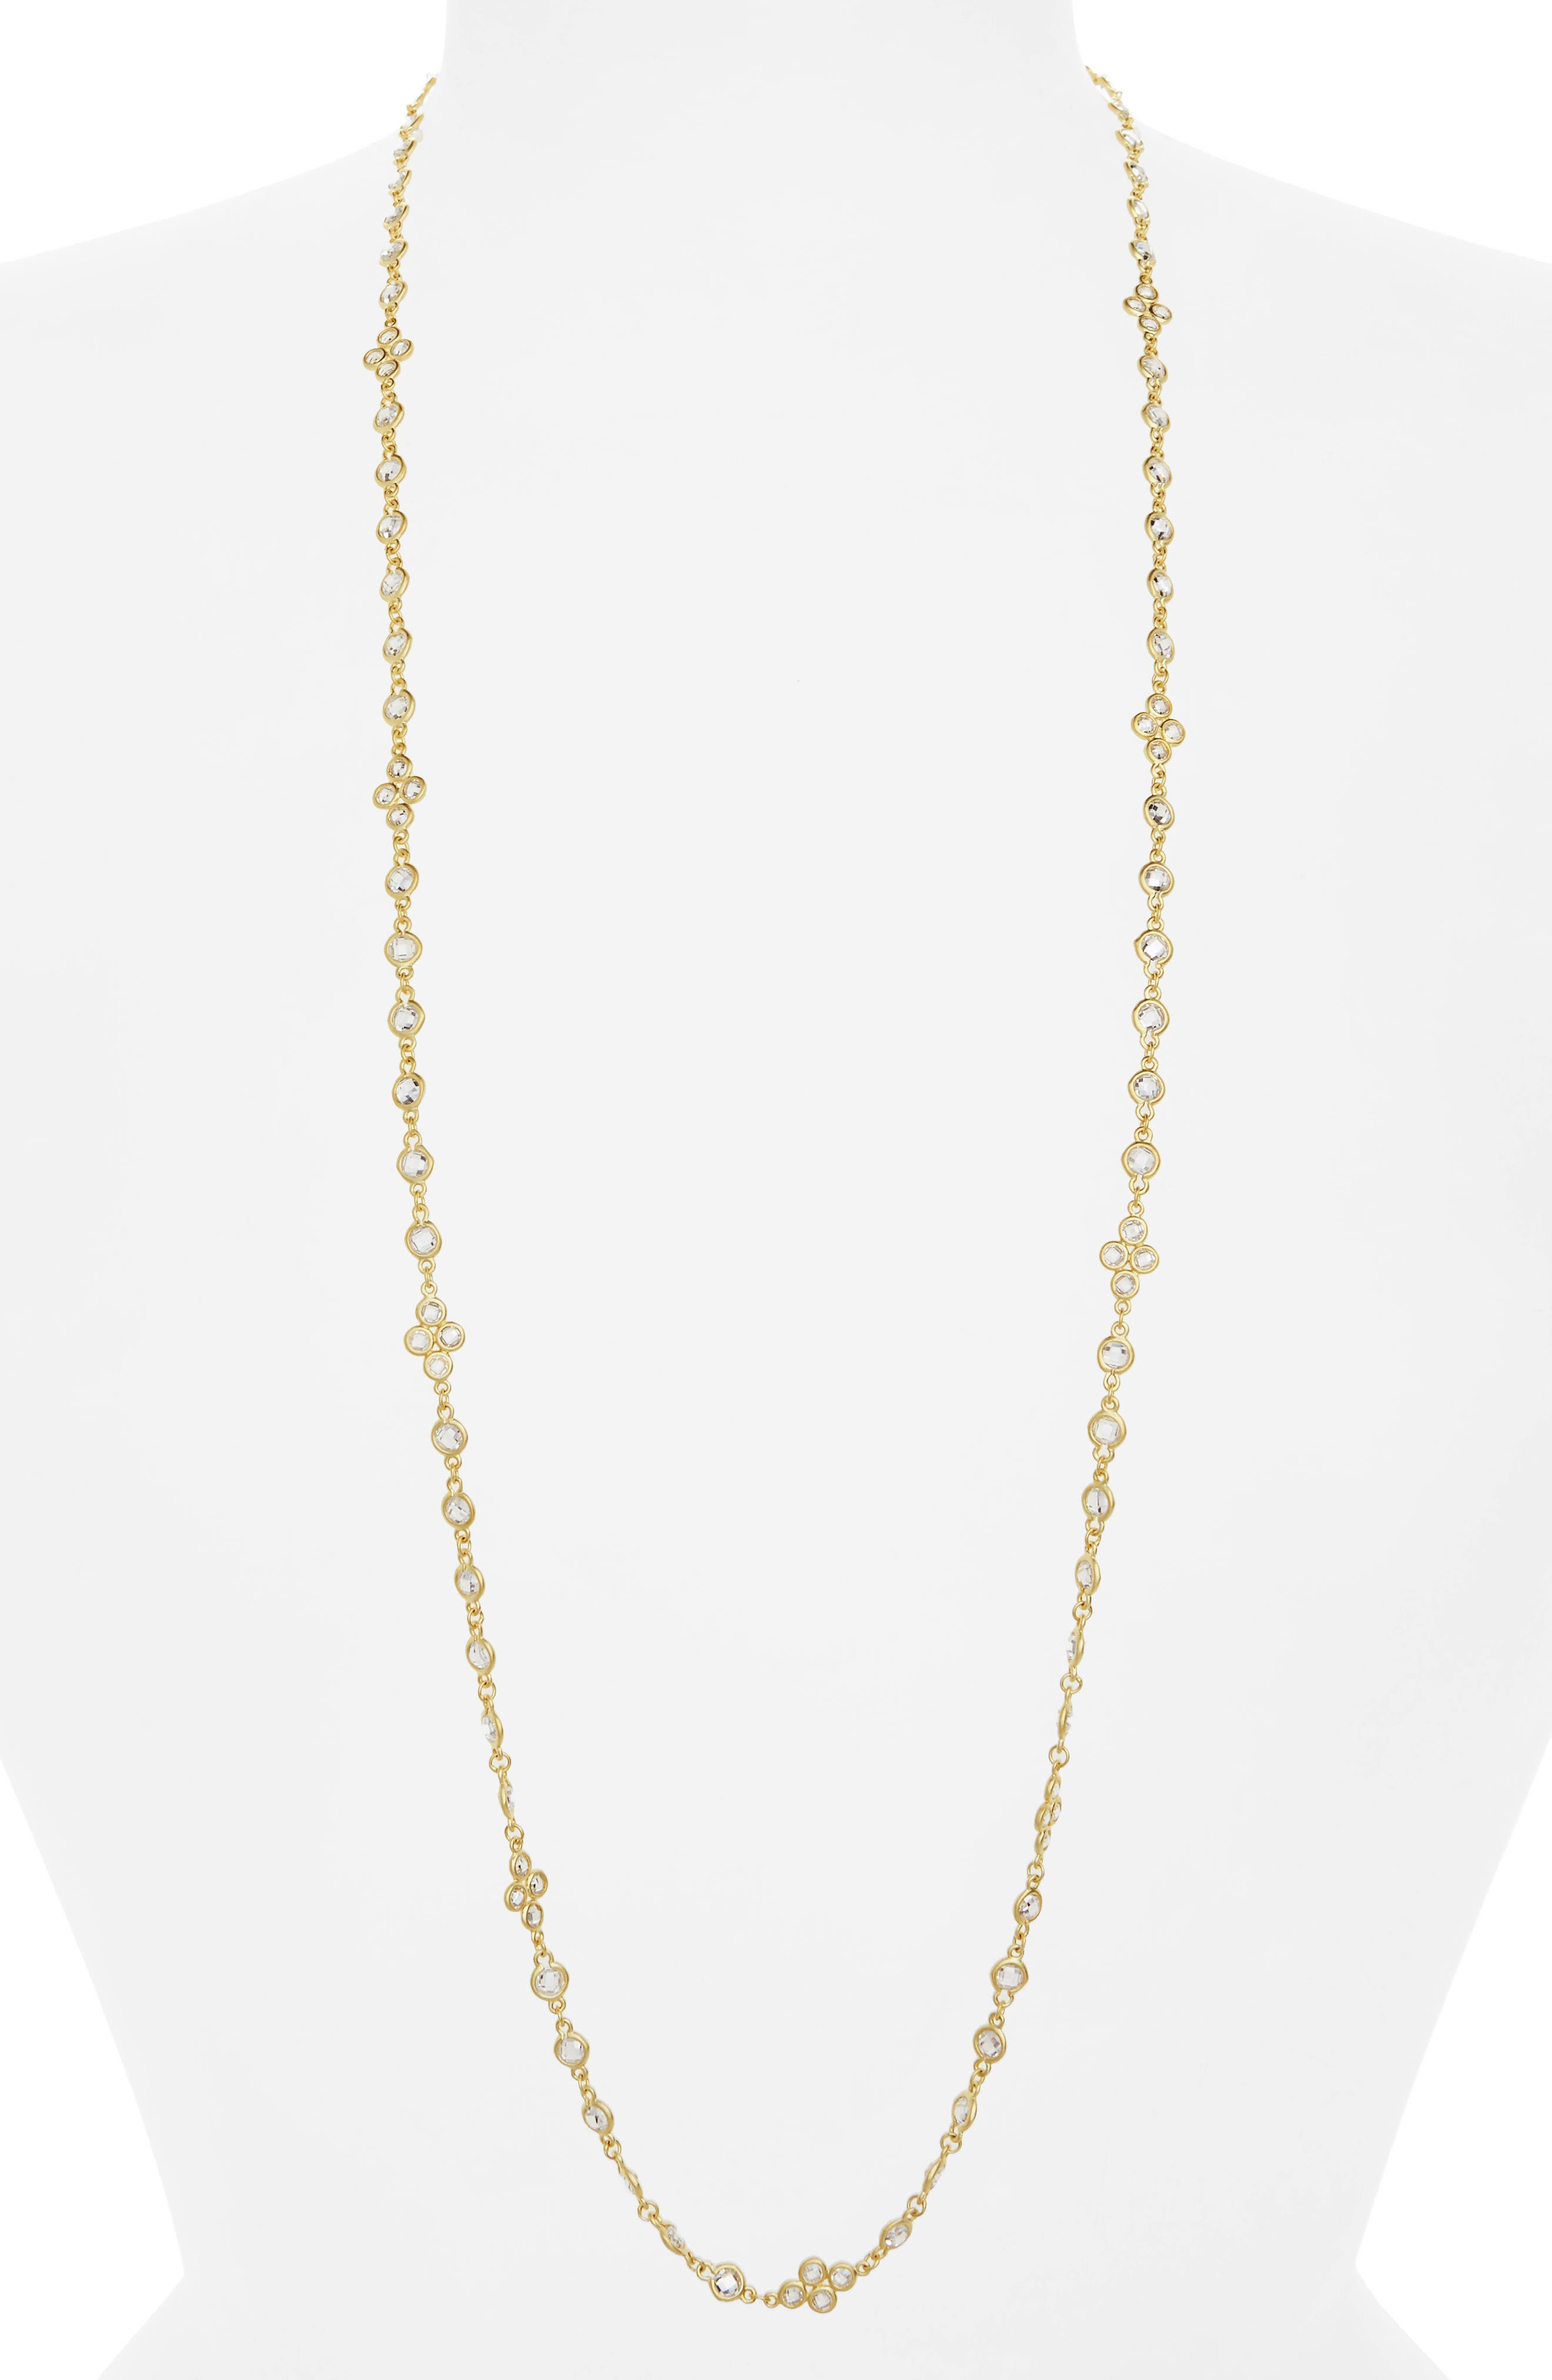 Cubic Zirconia Necklace,                             Main thumbnail 1, color,                             710